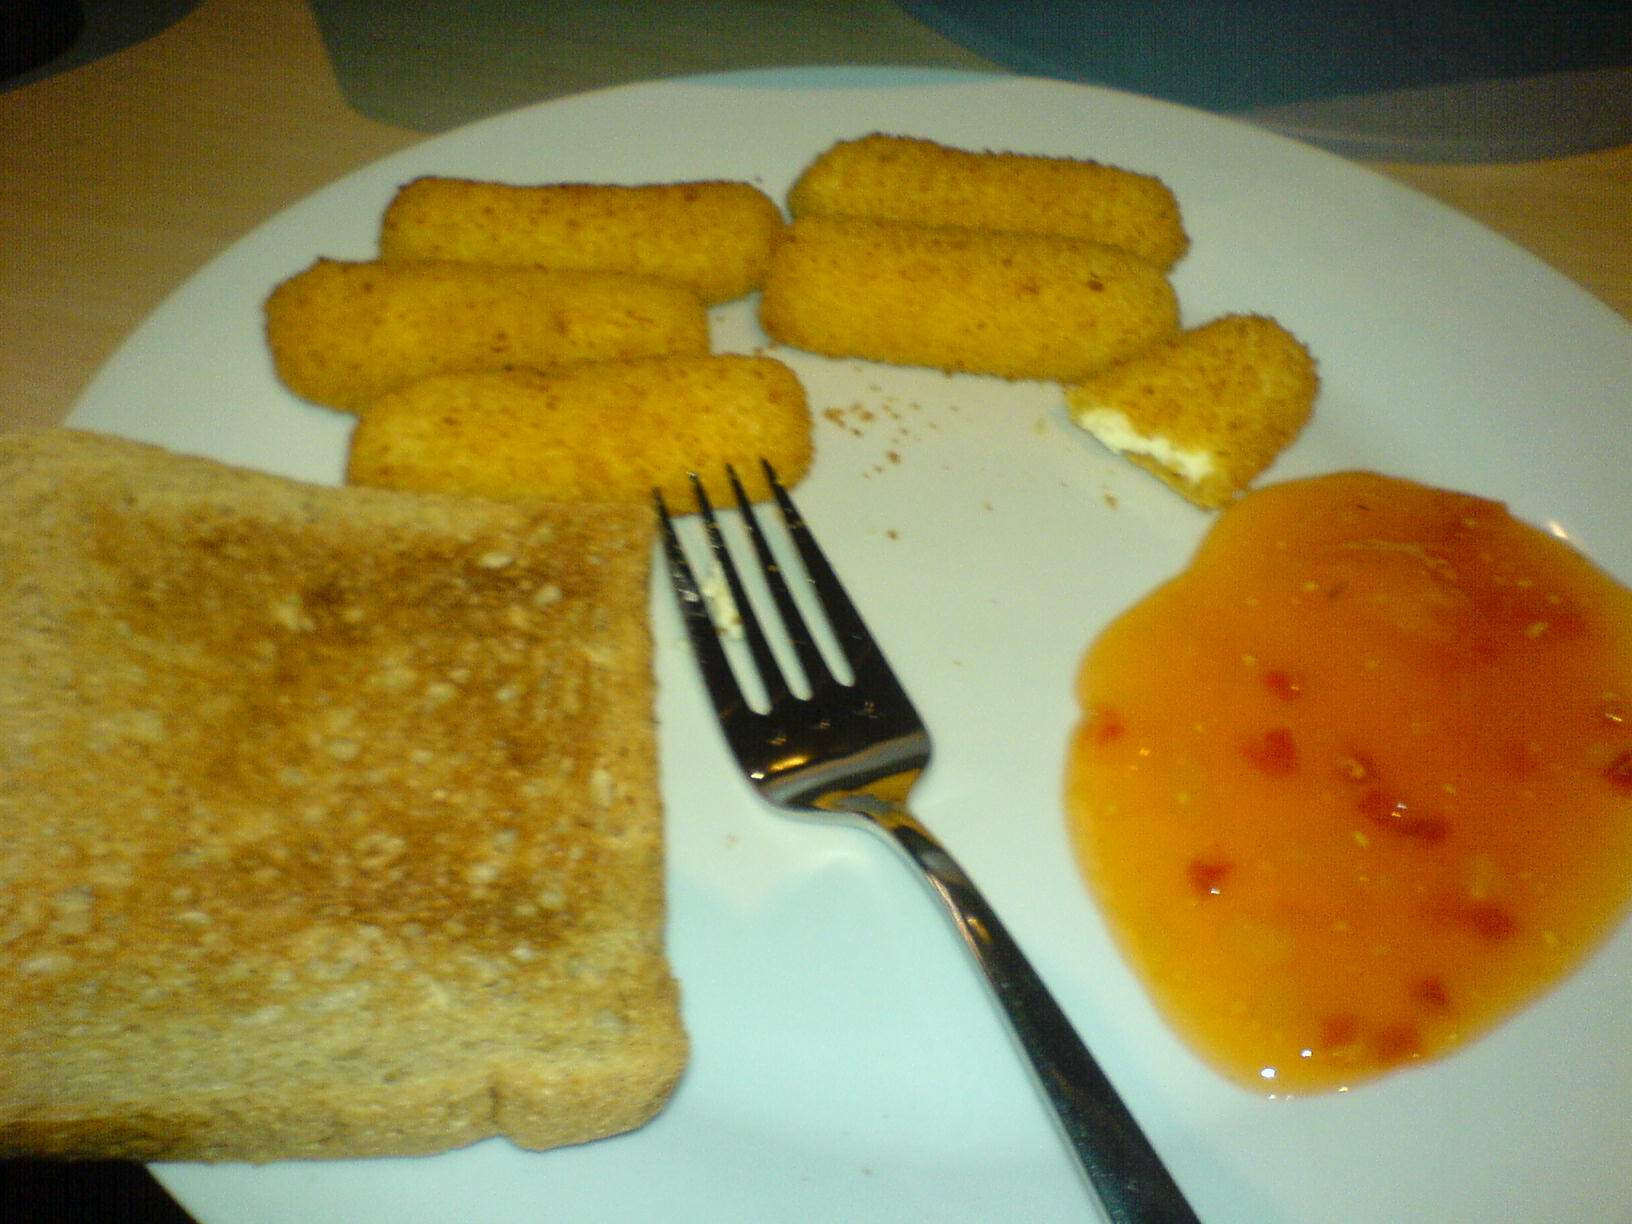 http://foodloader.net/Holz_2009-01-29_Frischkaese-Sticks_mit_Toast.jpg